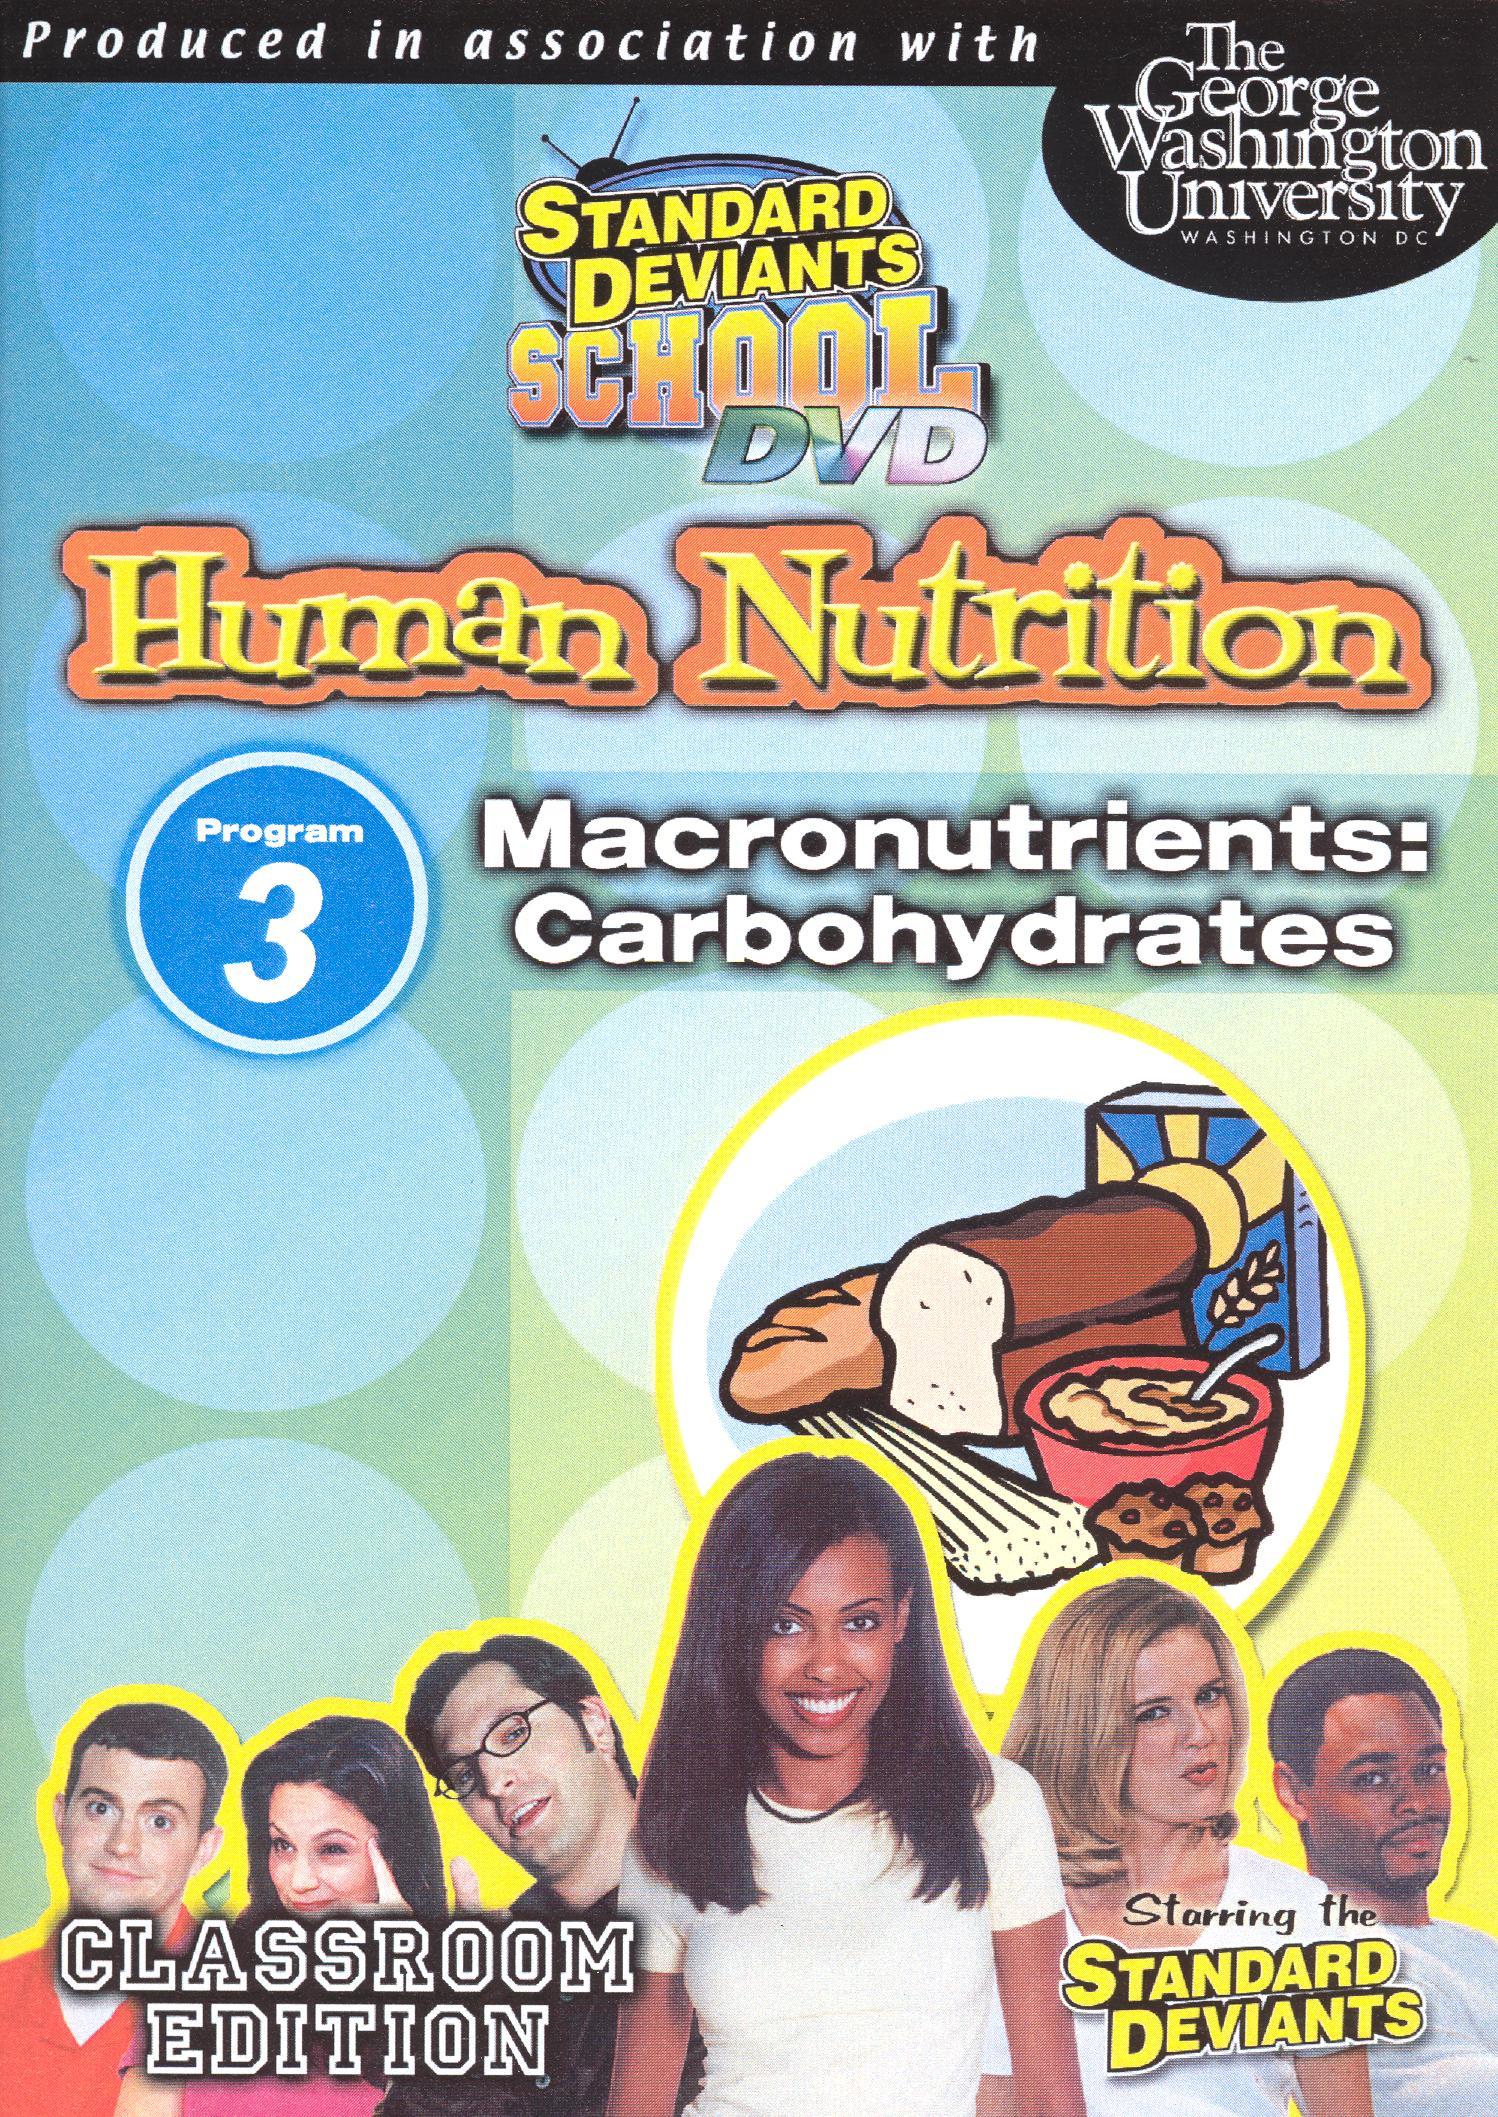 Standard Deviants School: Human Nutrition, Module 3 - Macronutrients (Carbohydrates)